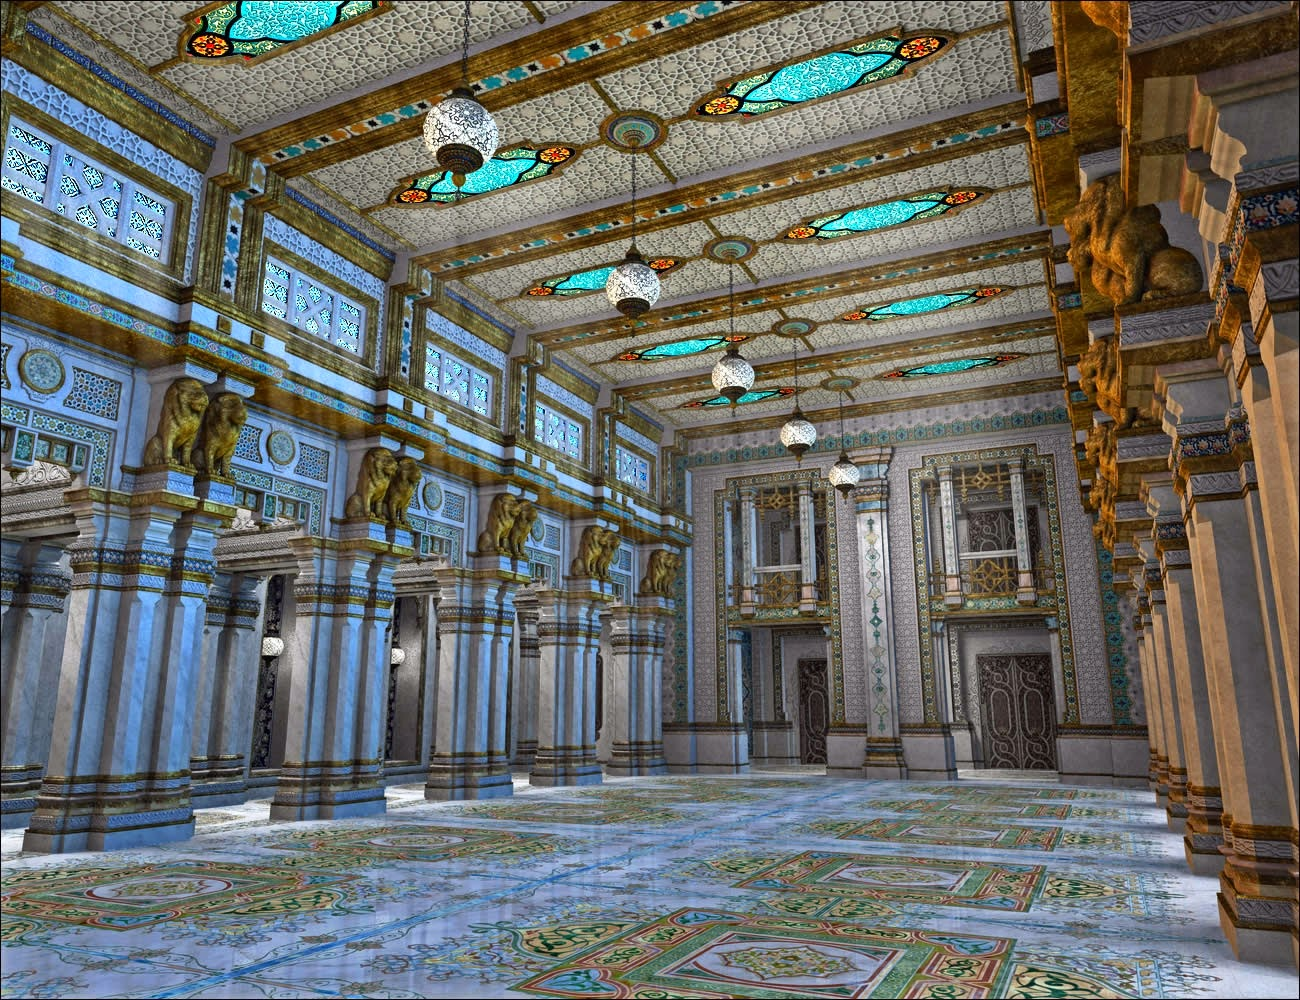 Download Daz Studio 3 For Free Daz 3d Persian Palace 3